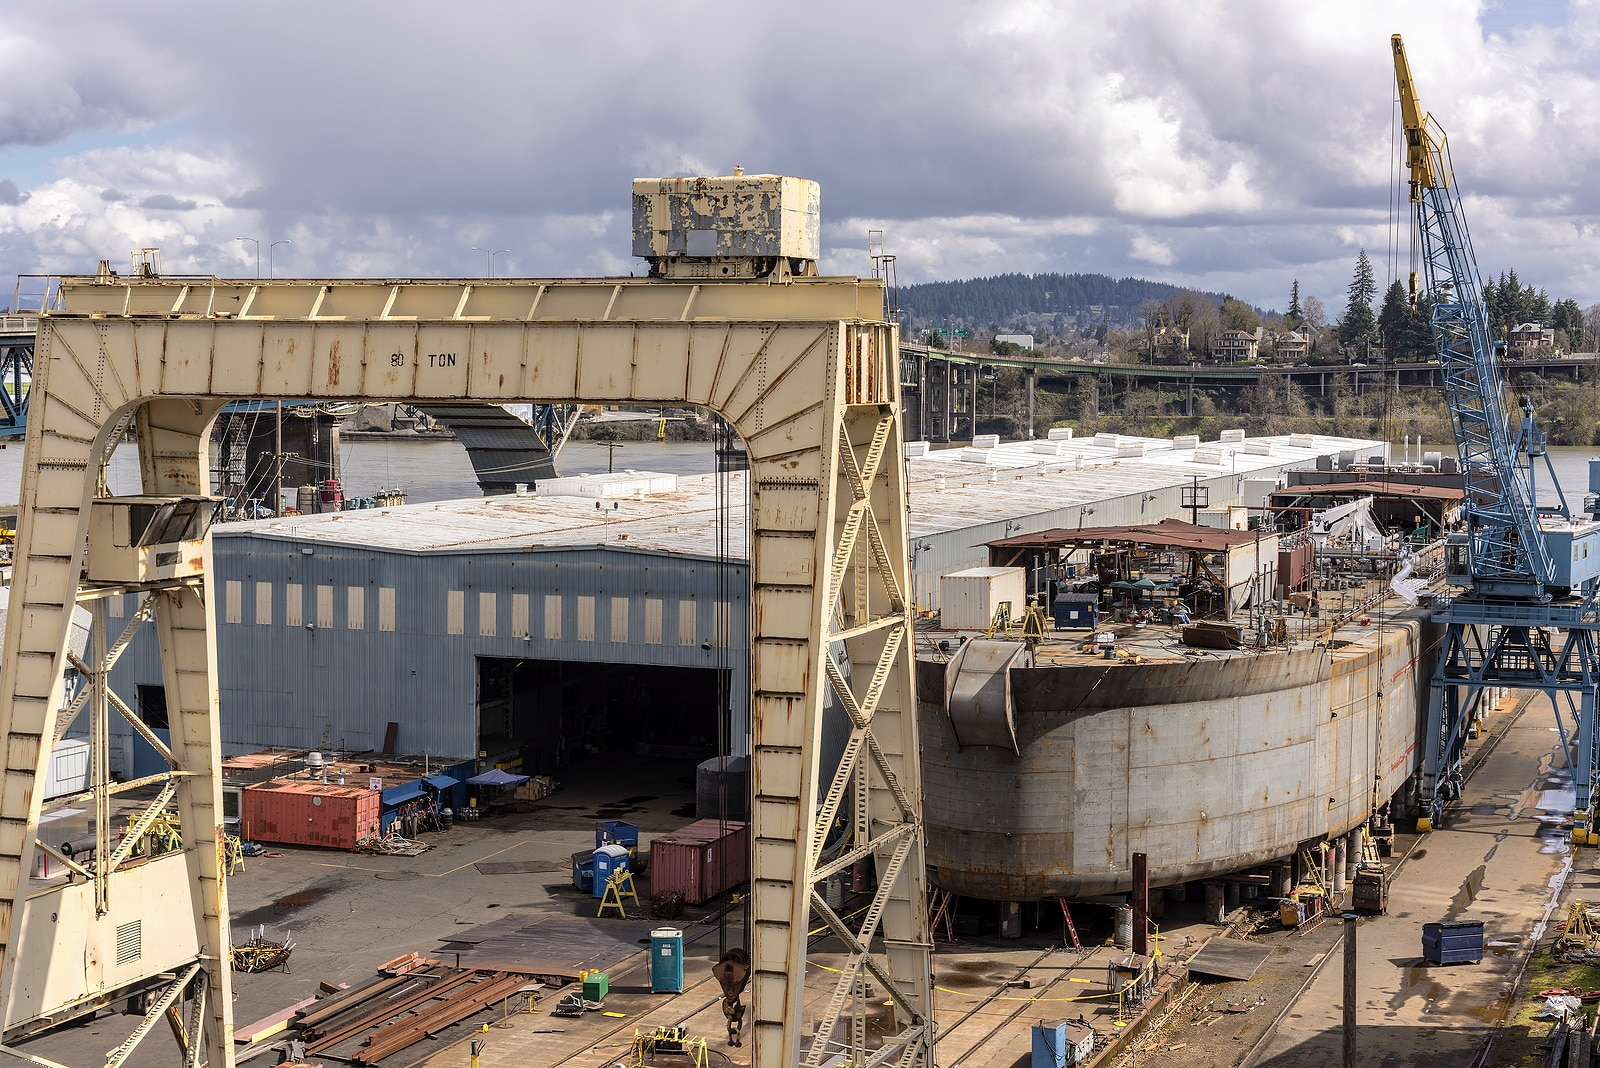 Shipyard and barge building in Portland Oregon.